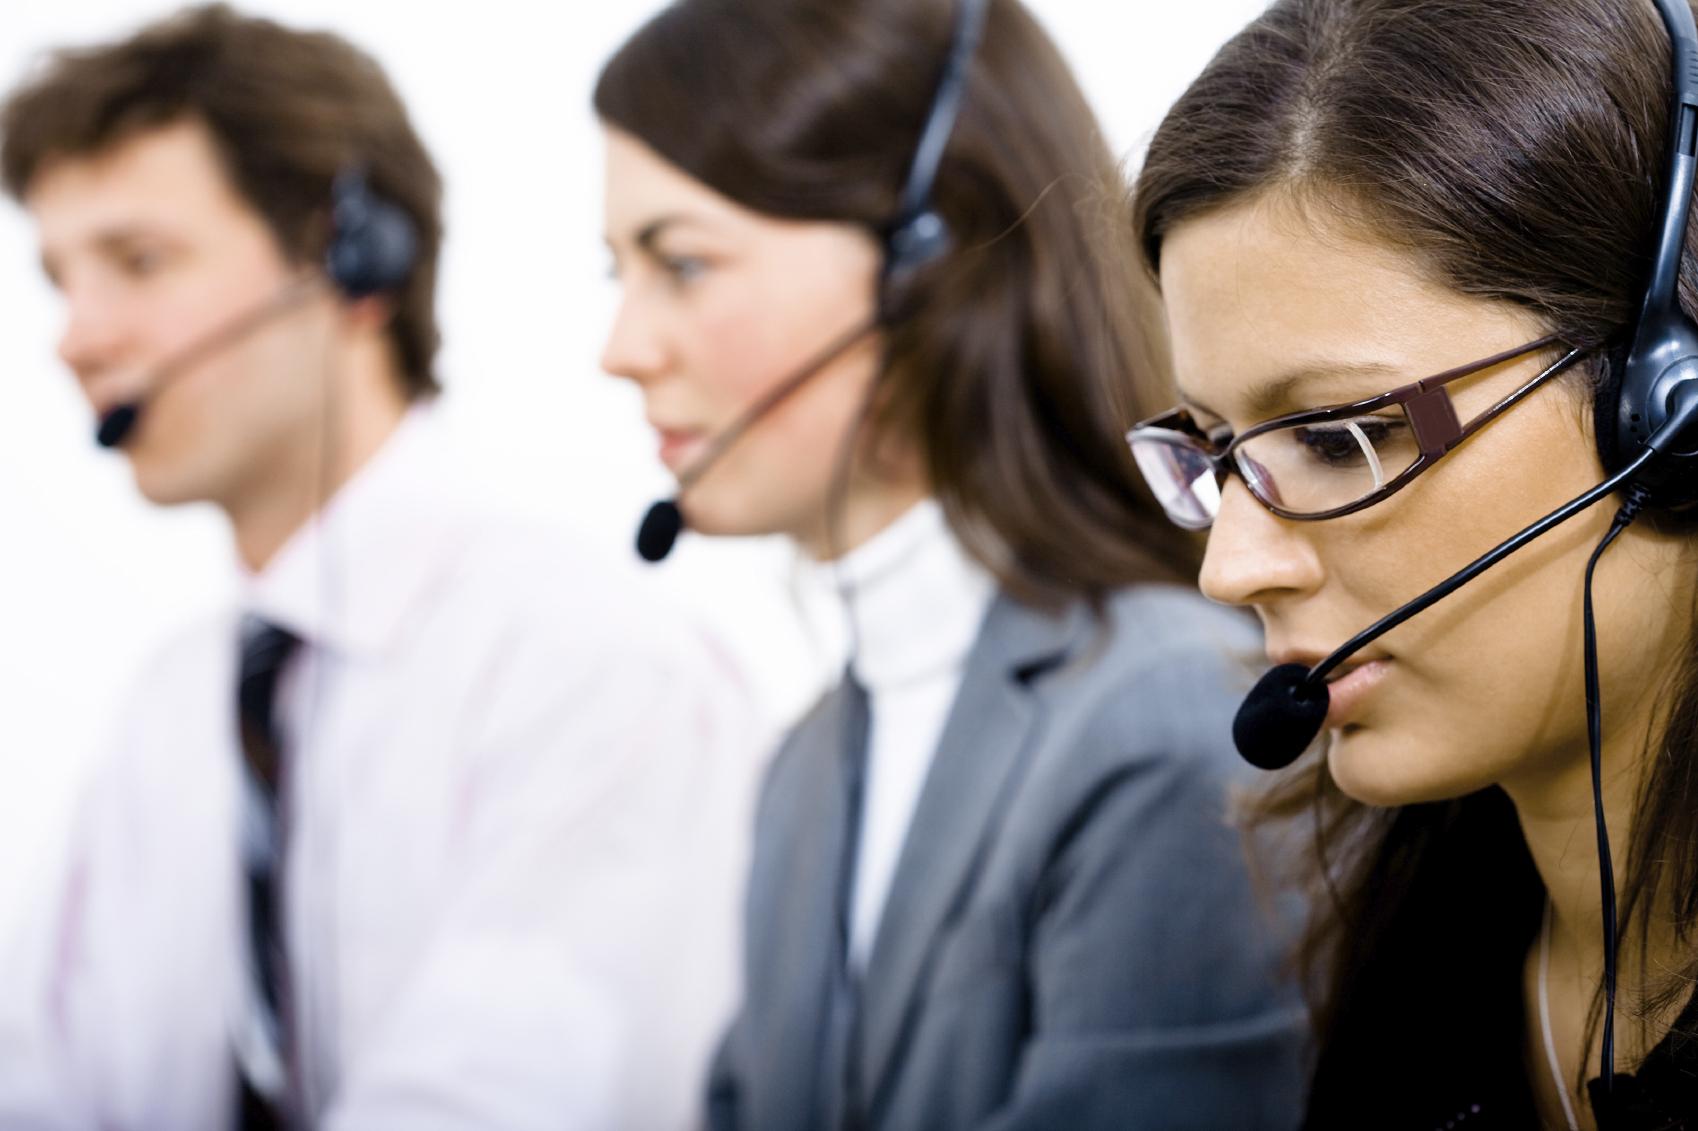 call-center-photo.jpg